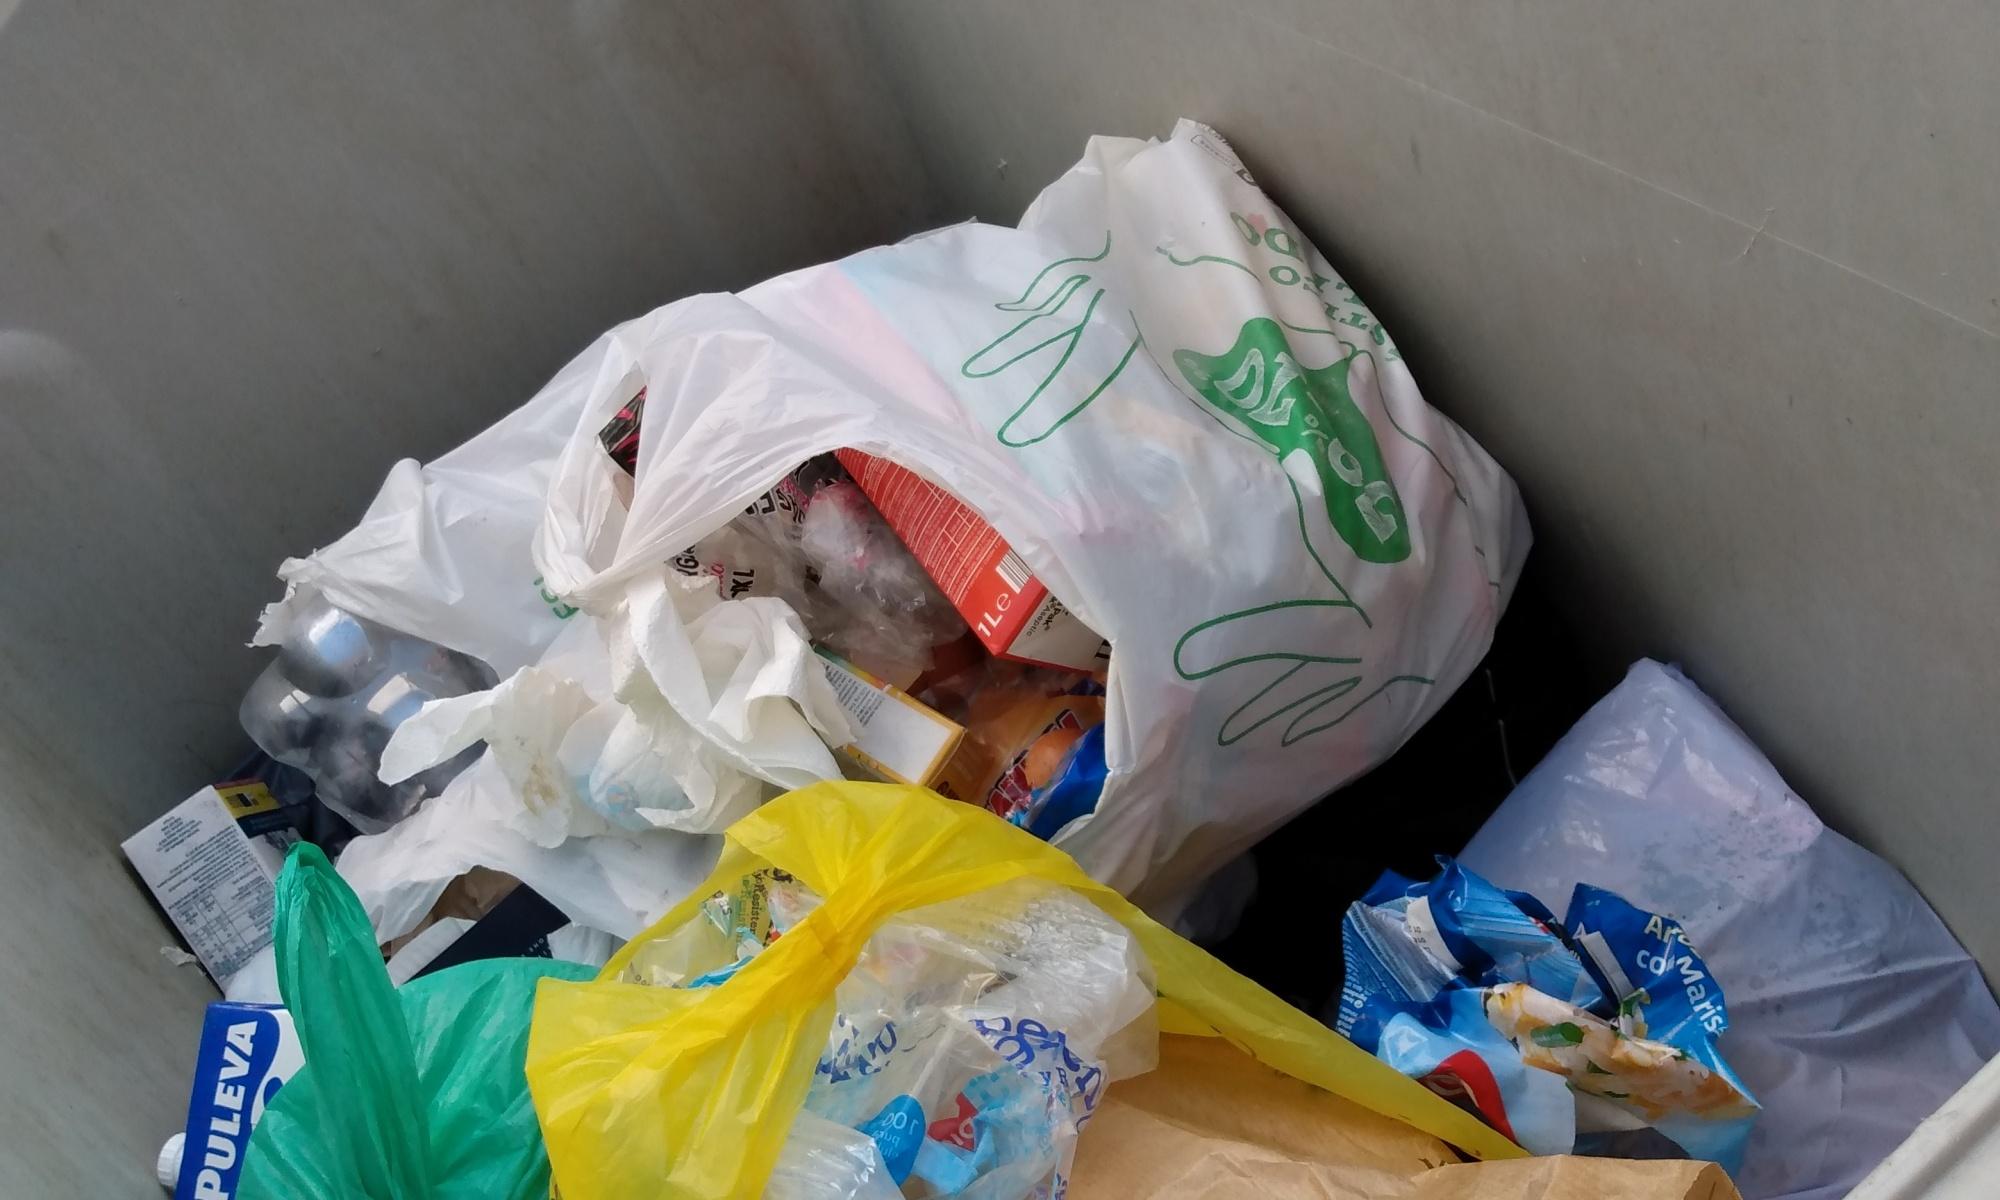 Contenedor de basura orgánica, Barrio San Isidro,Madrid